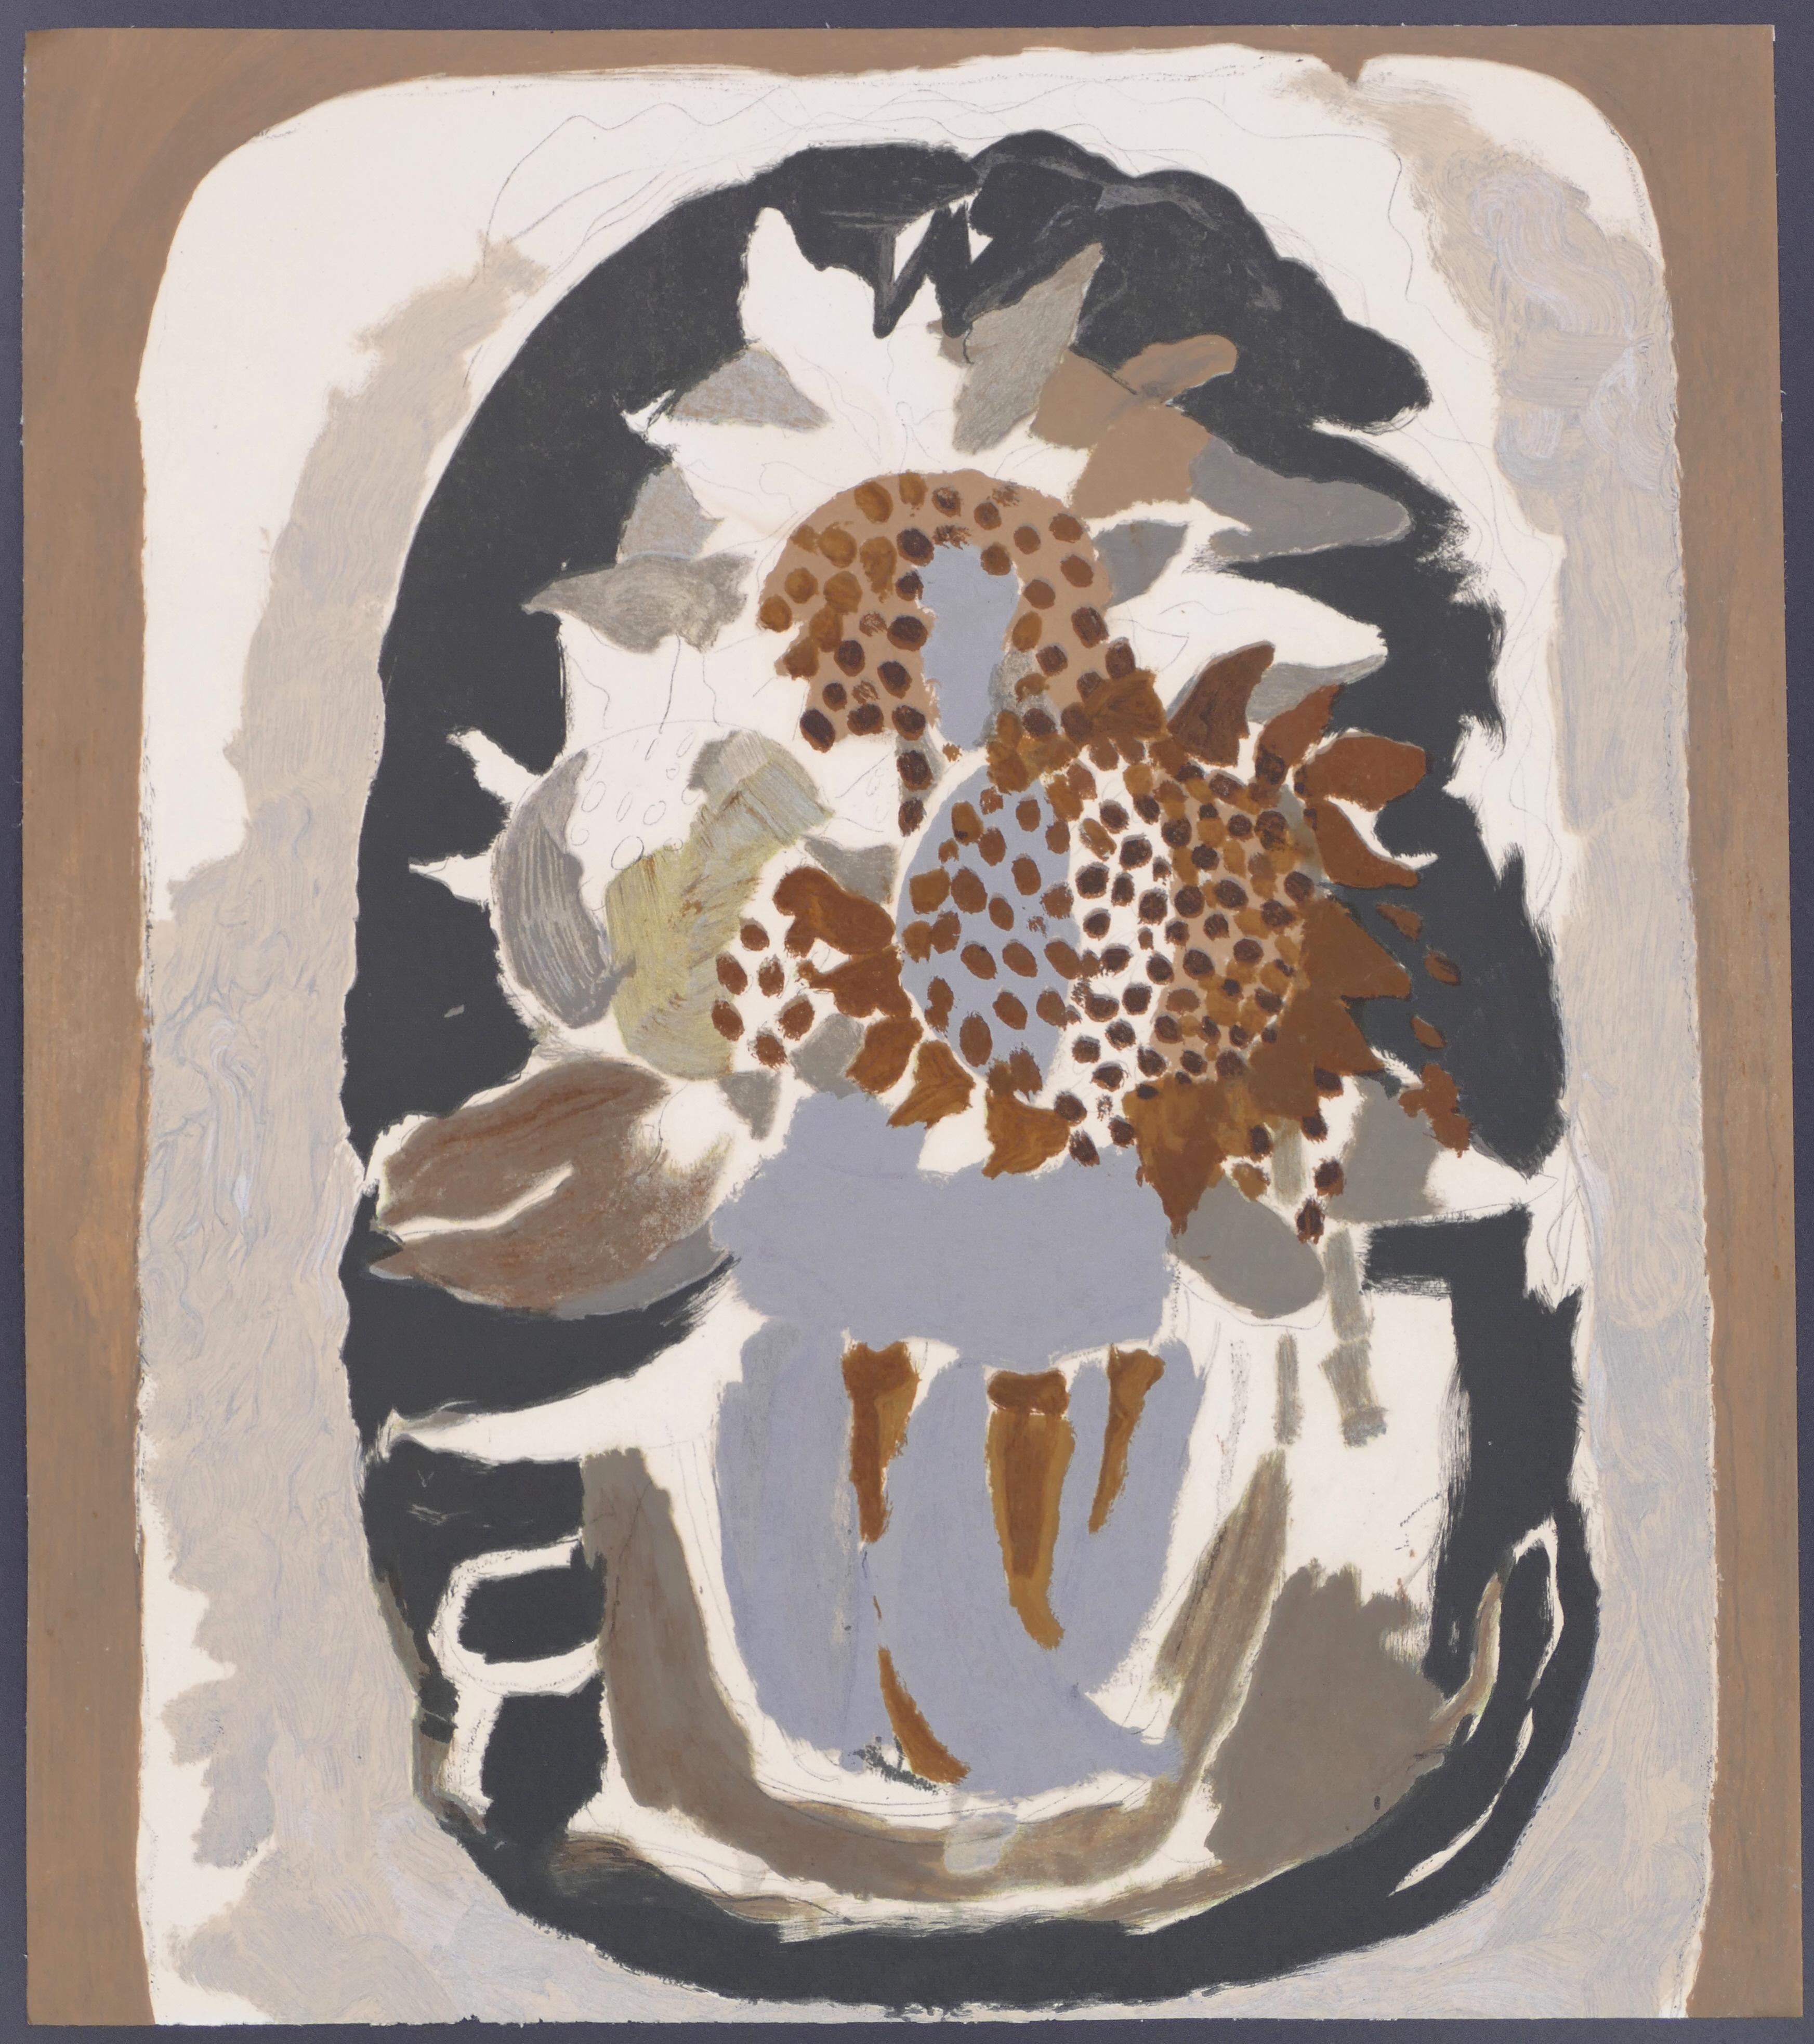 Le Repos - Original Lithograph After G. Braque - 1967